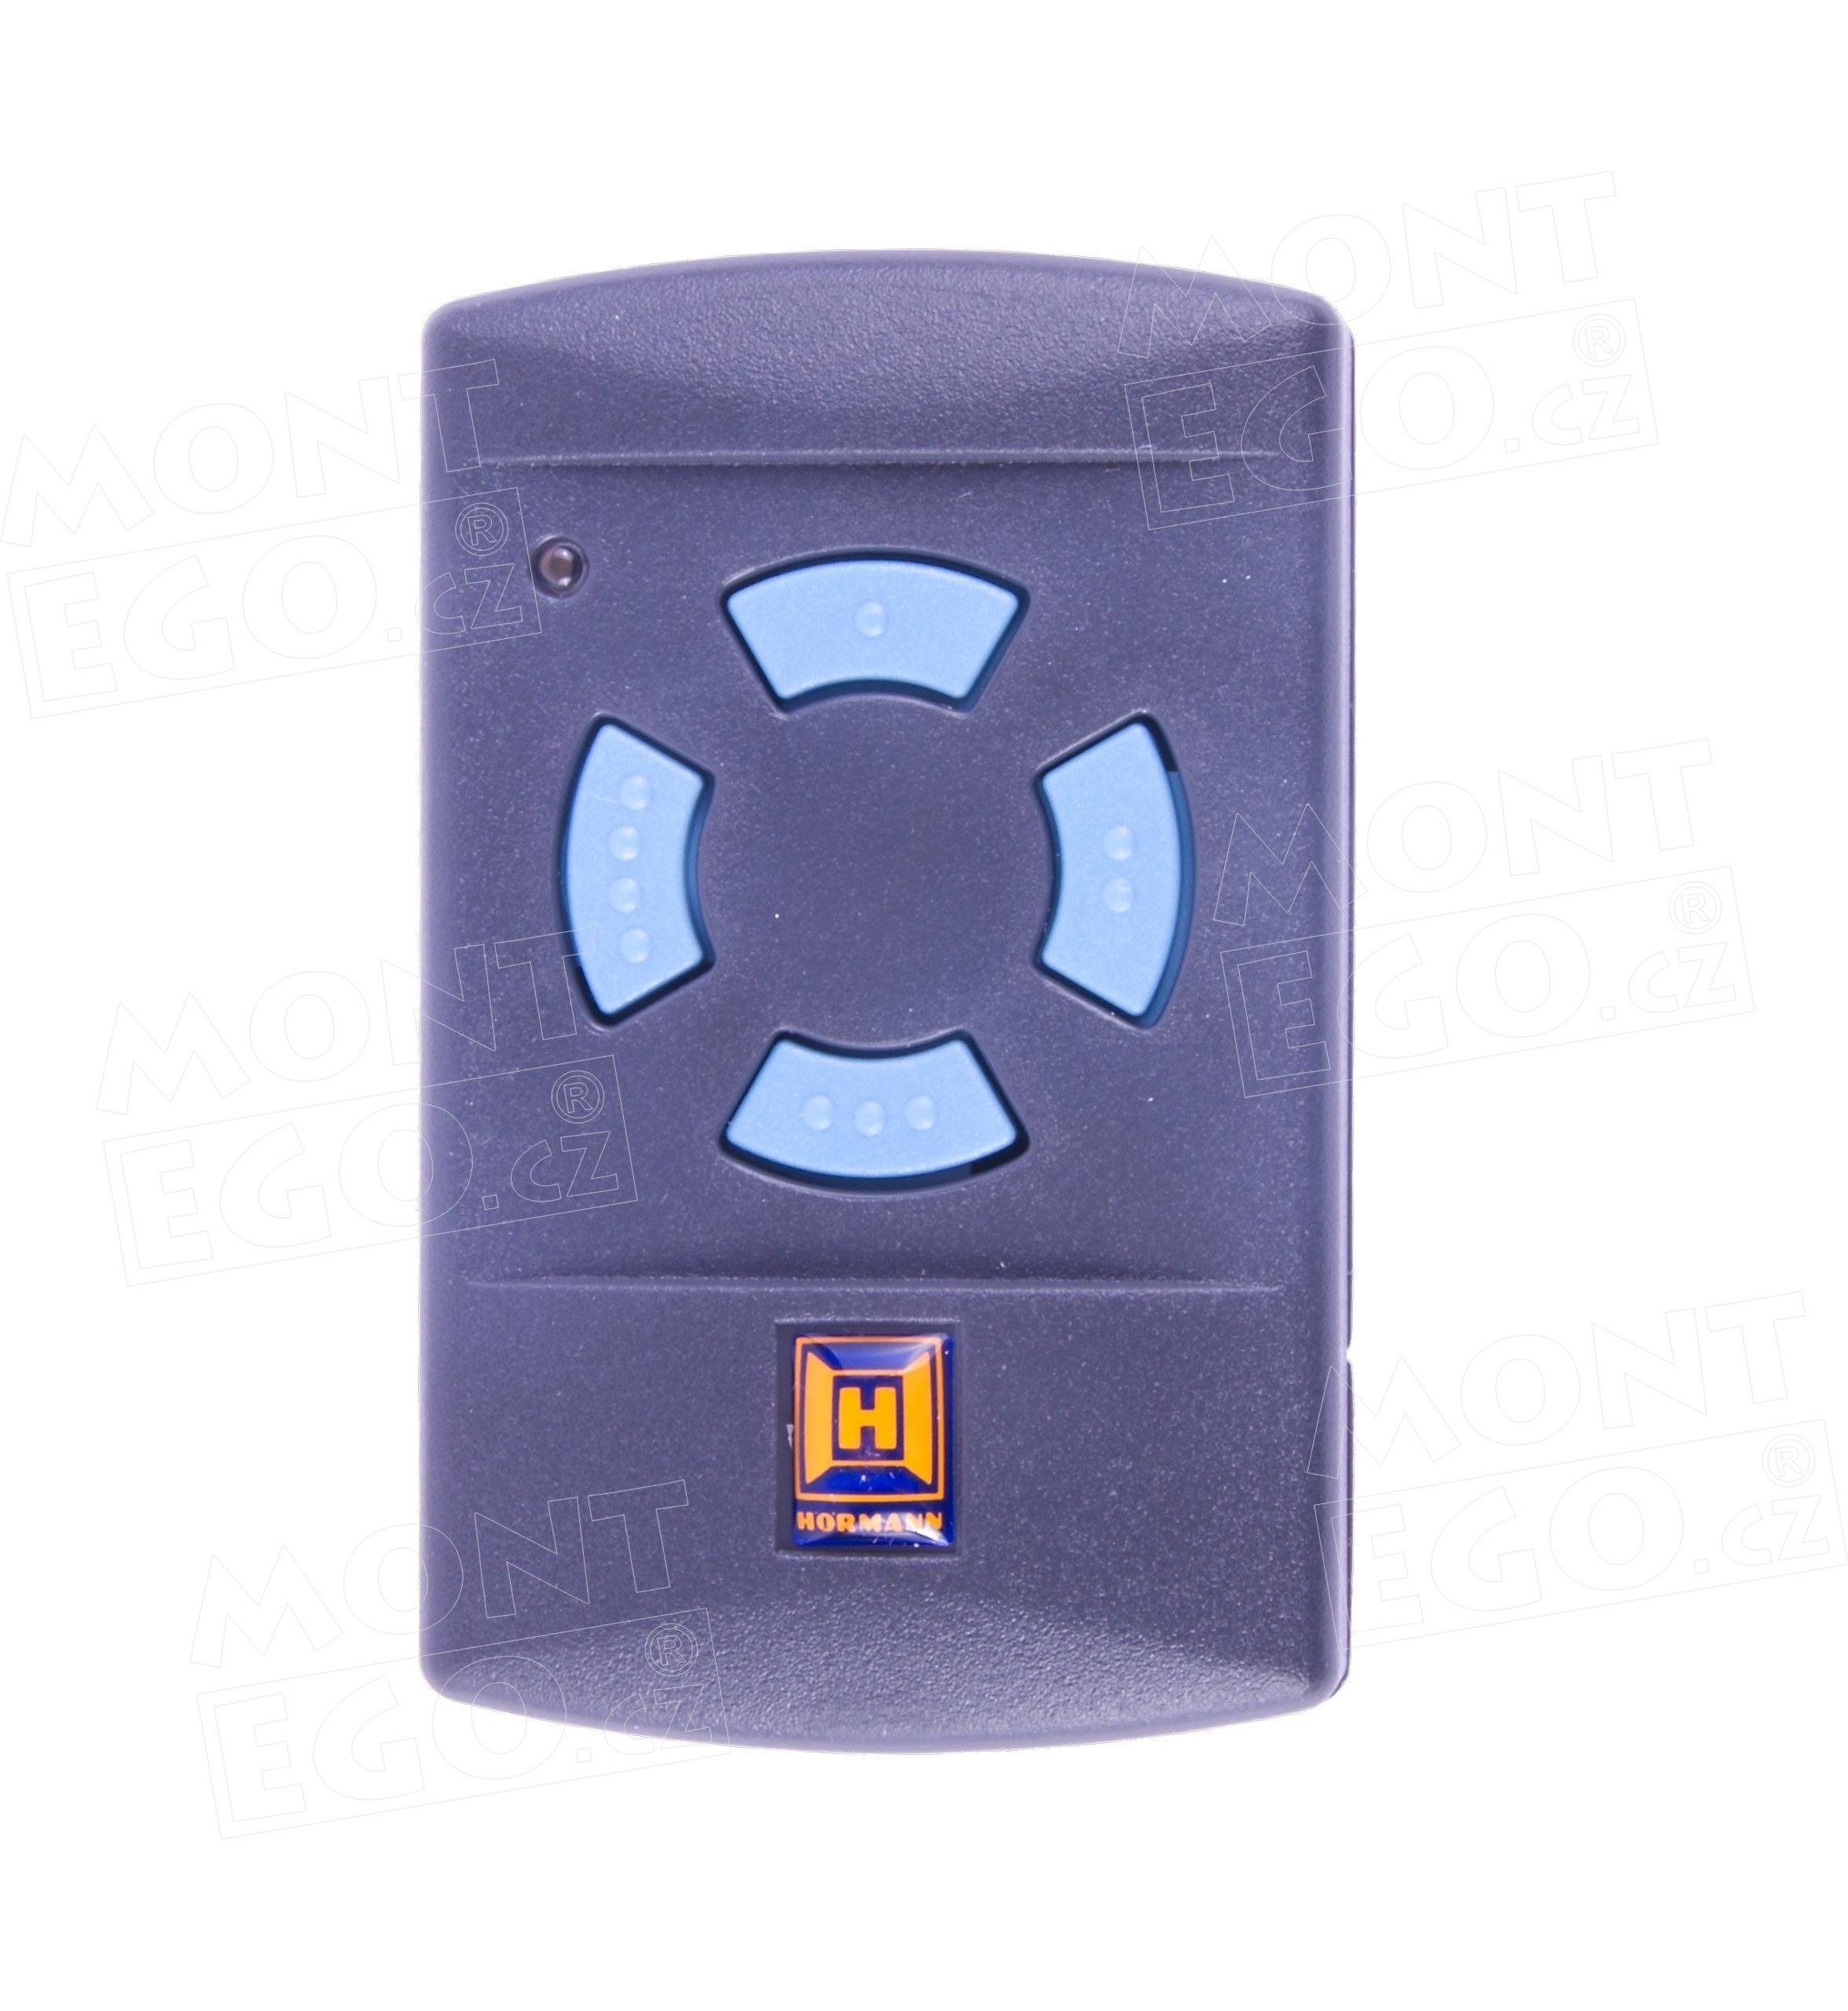 Dálkový ovladač Hörmann HSM4, 4 kanálový ovládač, 868 MHz modrá tlačítka